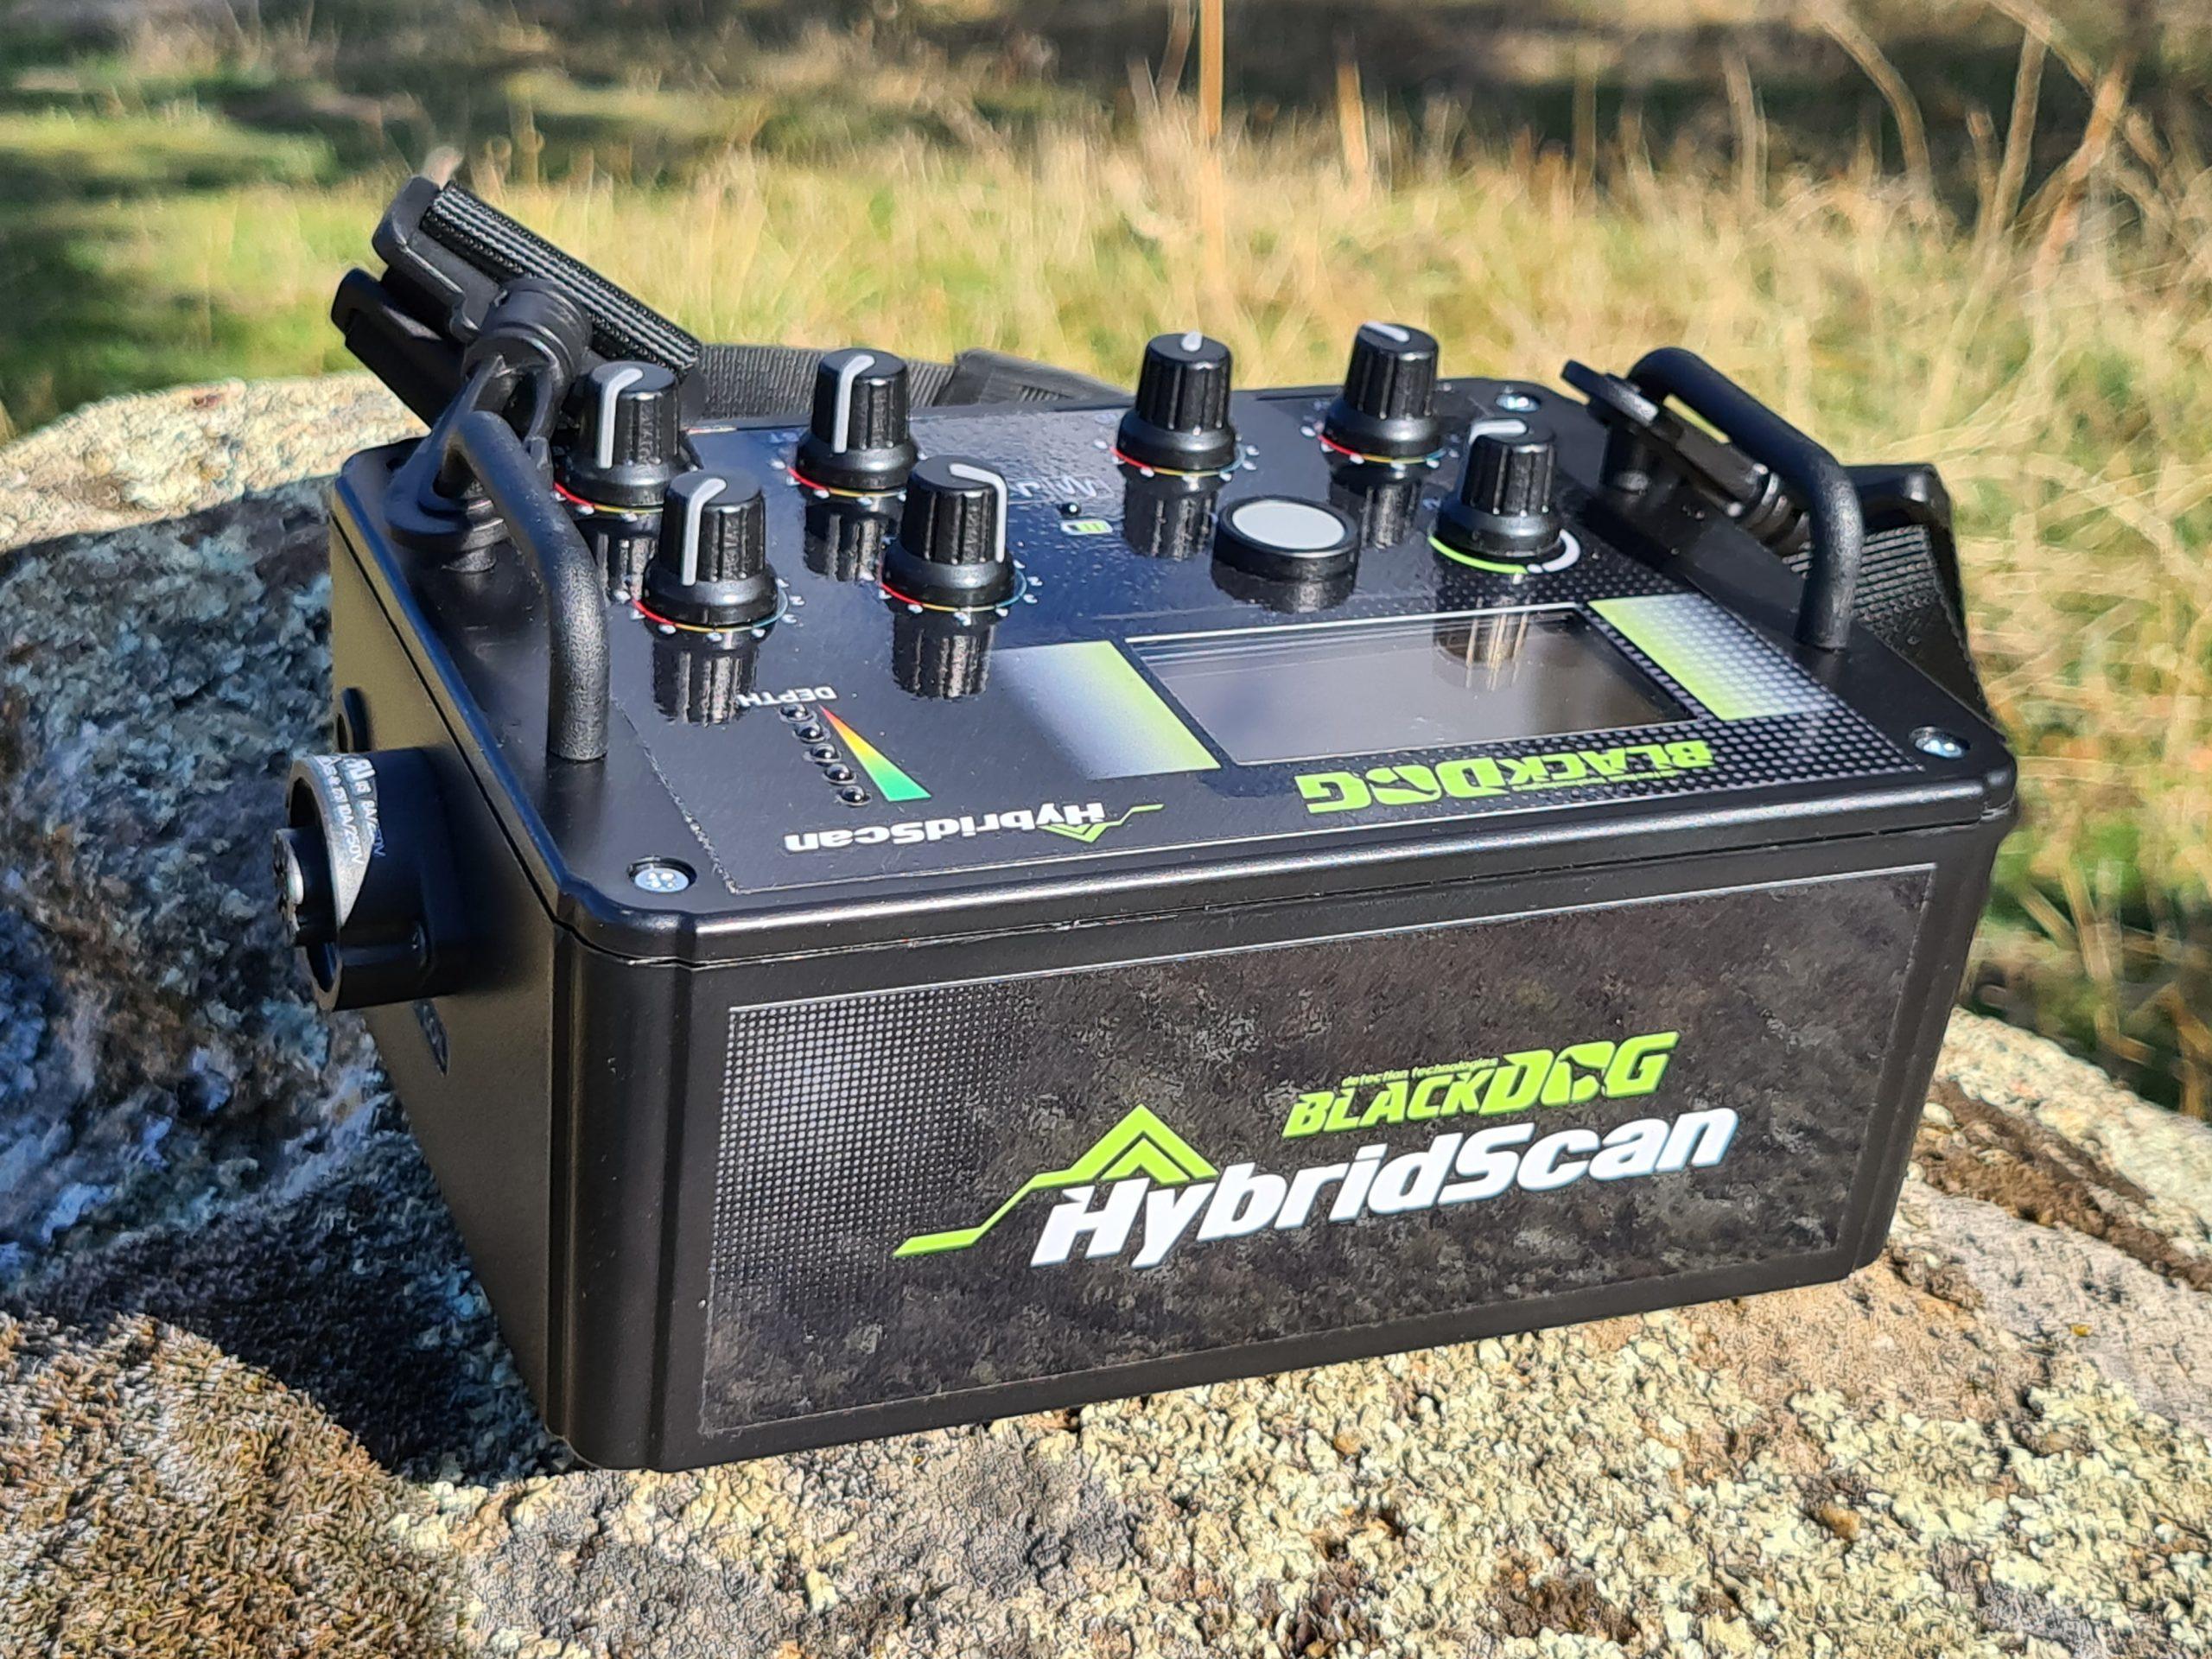 detector de metales hybridscan